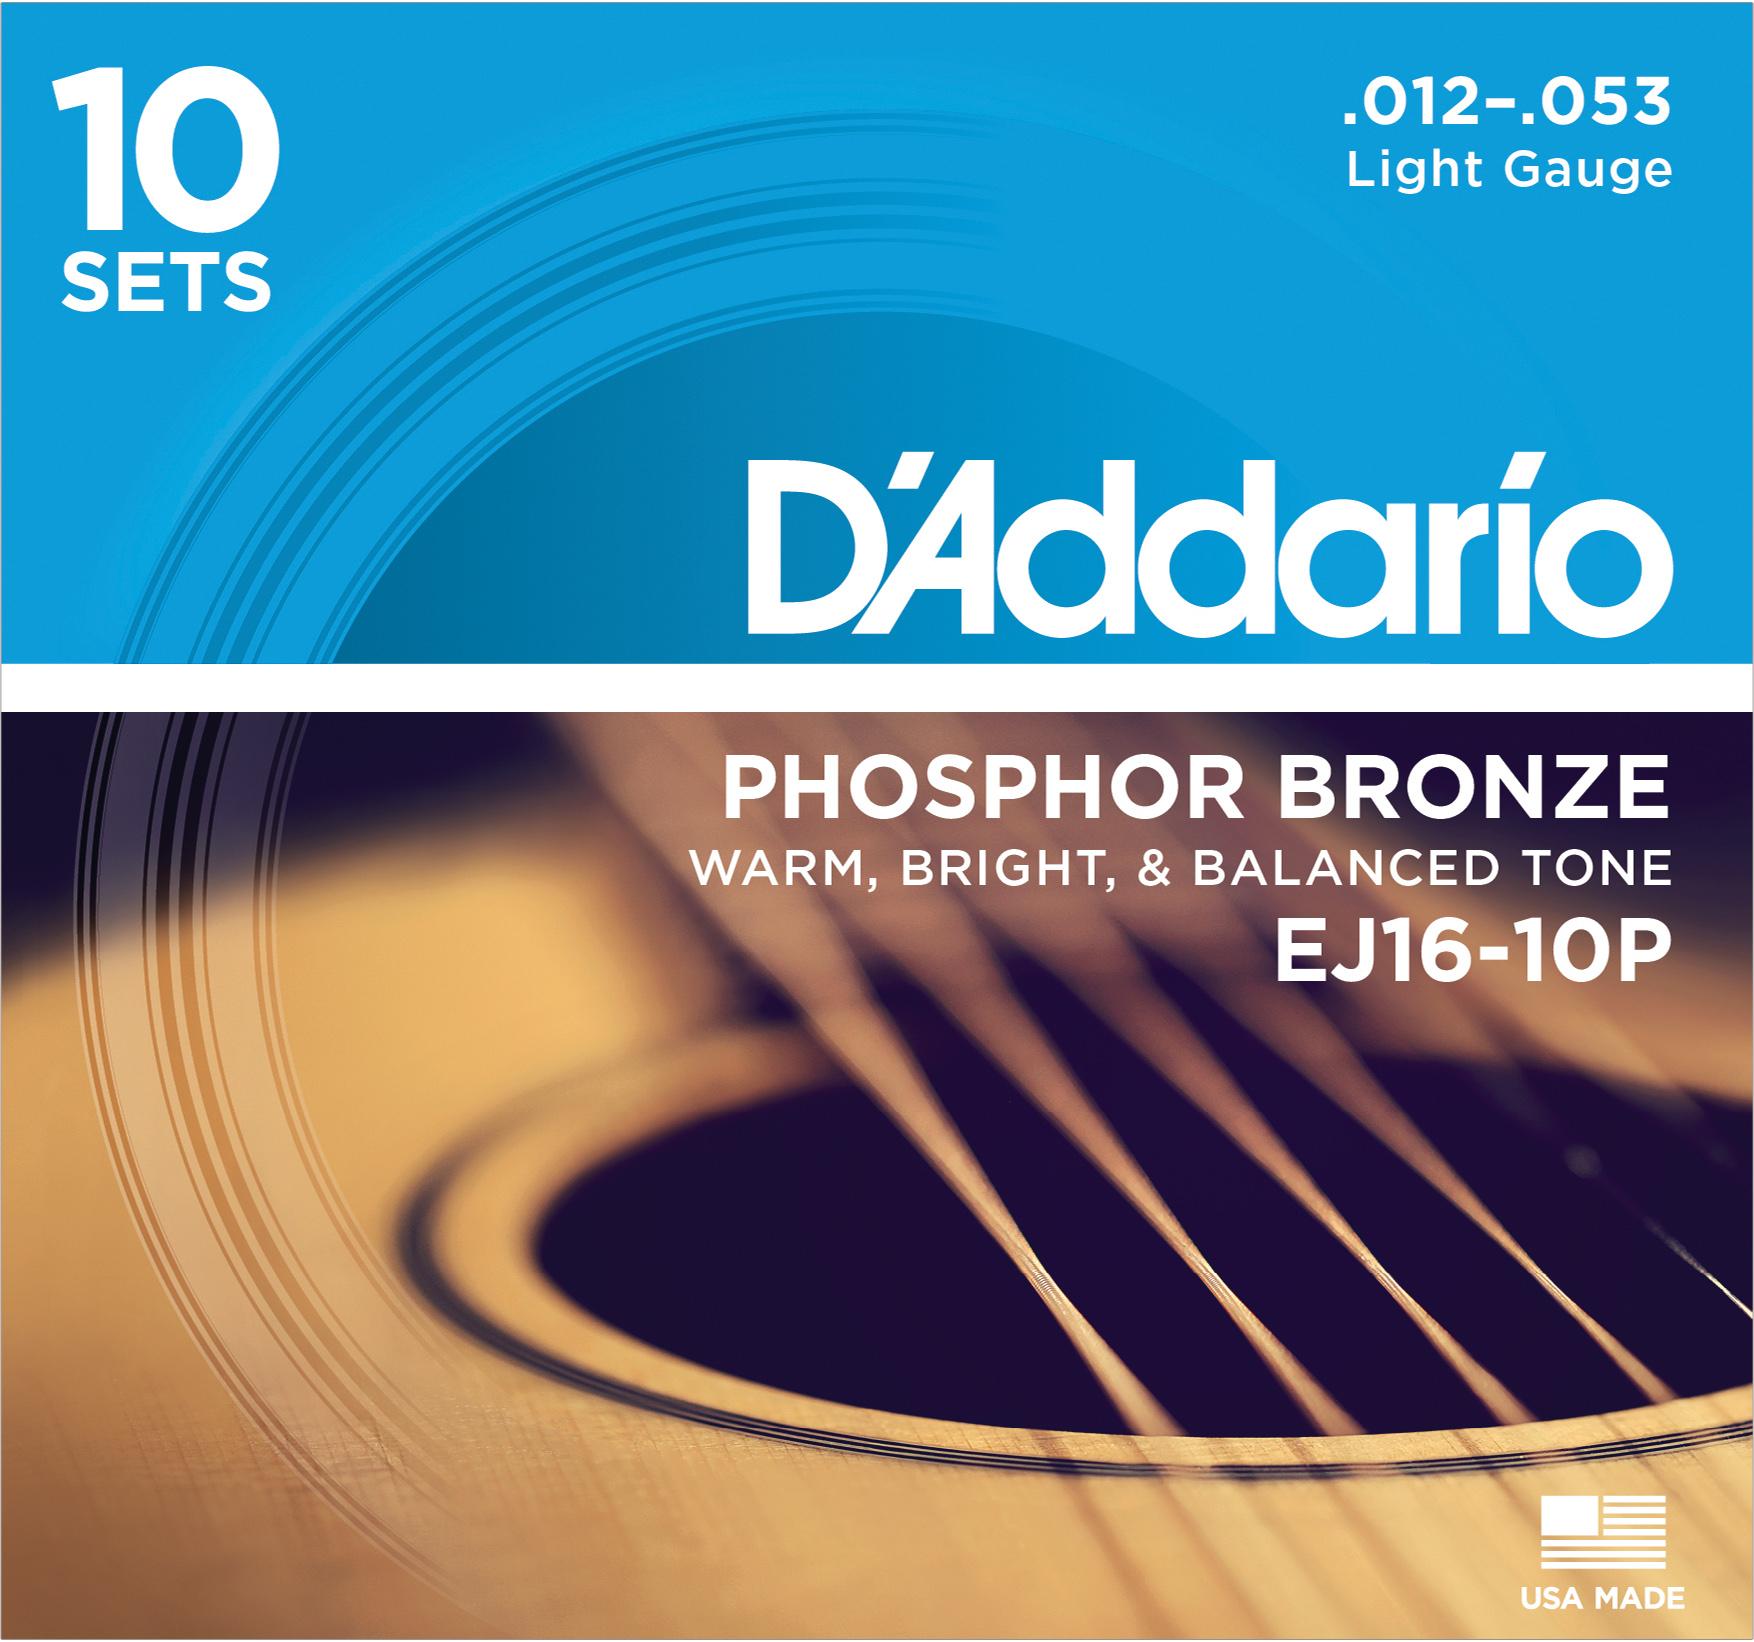 D'ADDARIO EJ16-10P PROPACK PHOS BRONZE LIGHT